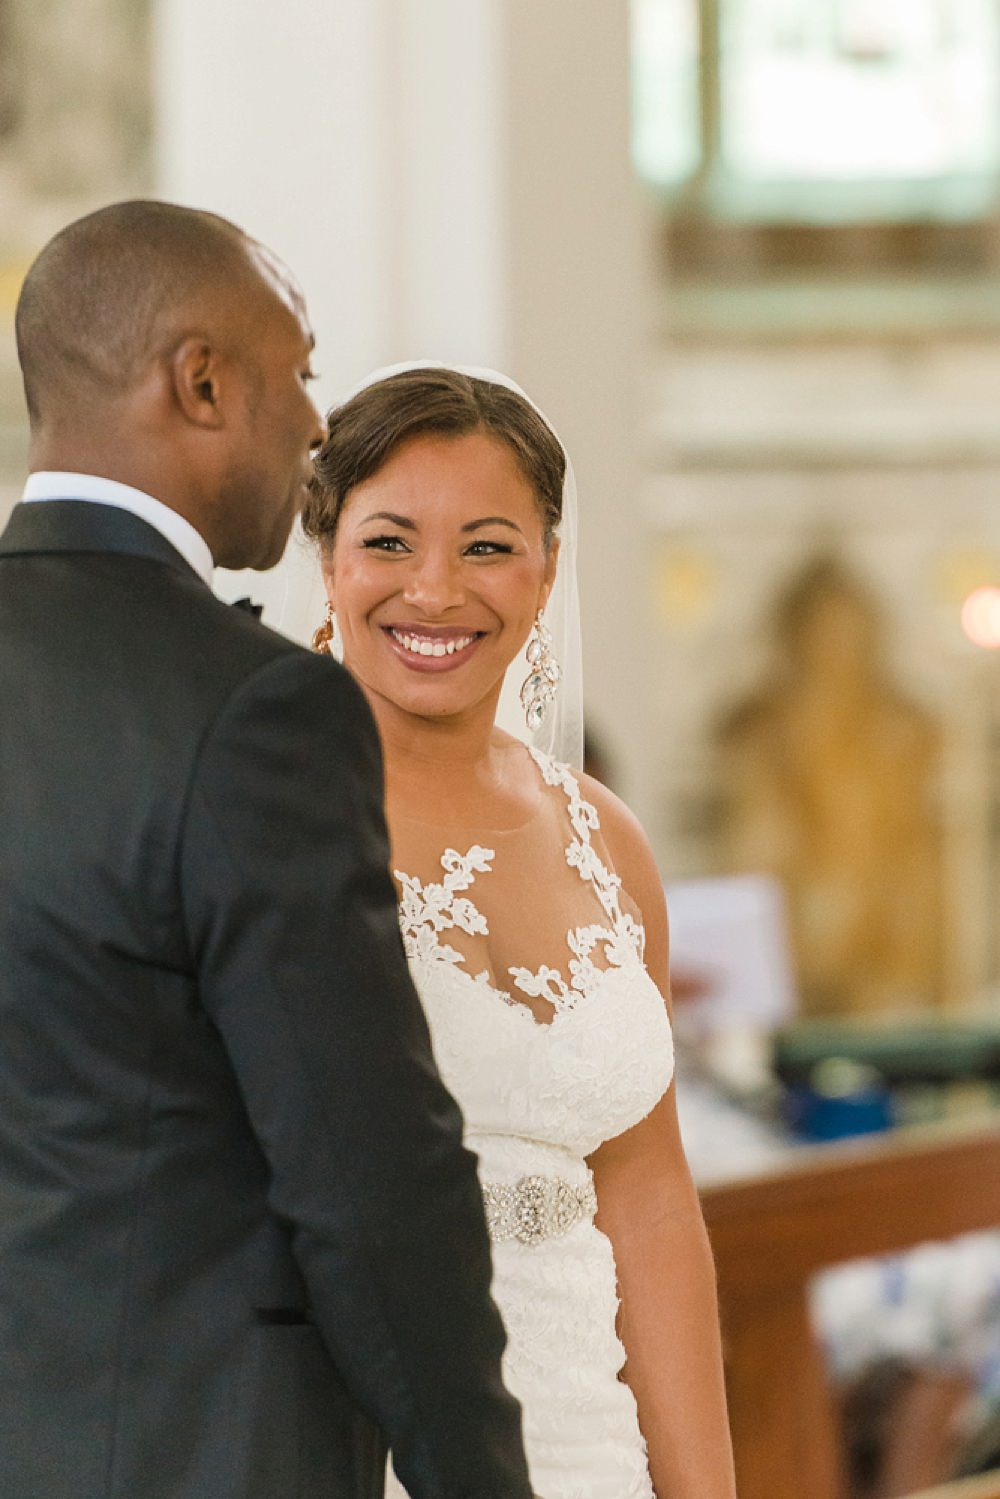 Bride Bridal La Sposa Fit & Flare Lace Dress Gown Floor Length Veil Hugo Boss Tuxedo Groom Stoke Place Wedding Hannah McClune Photography